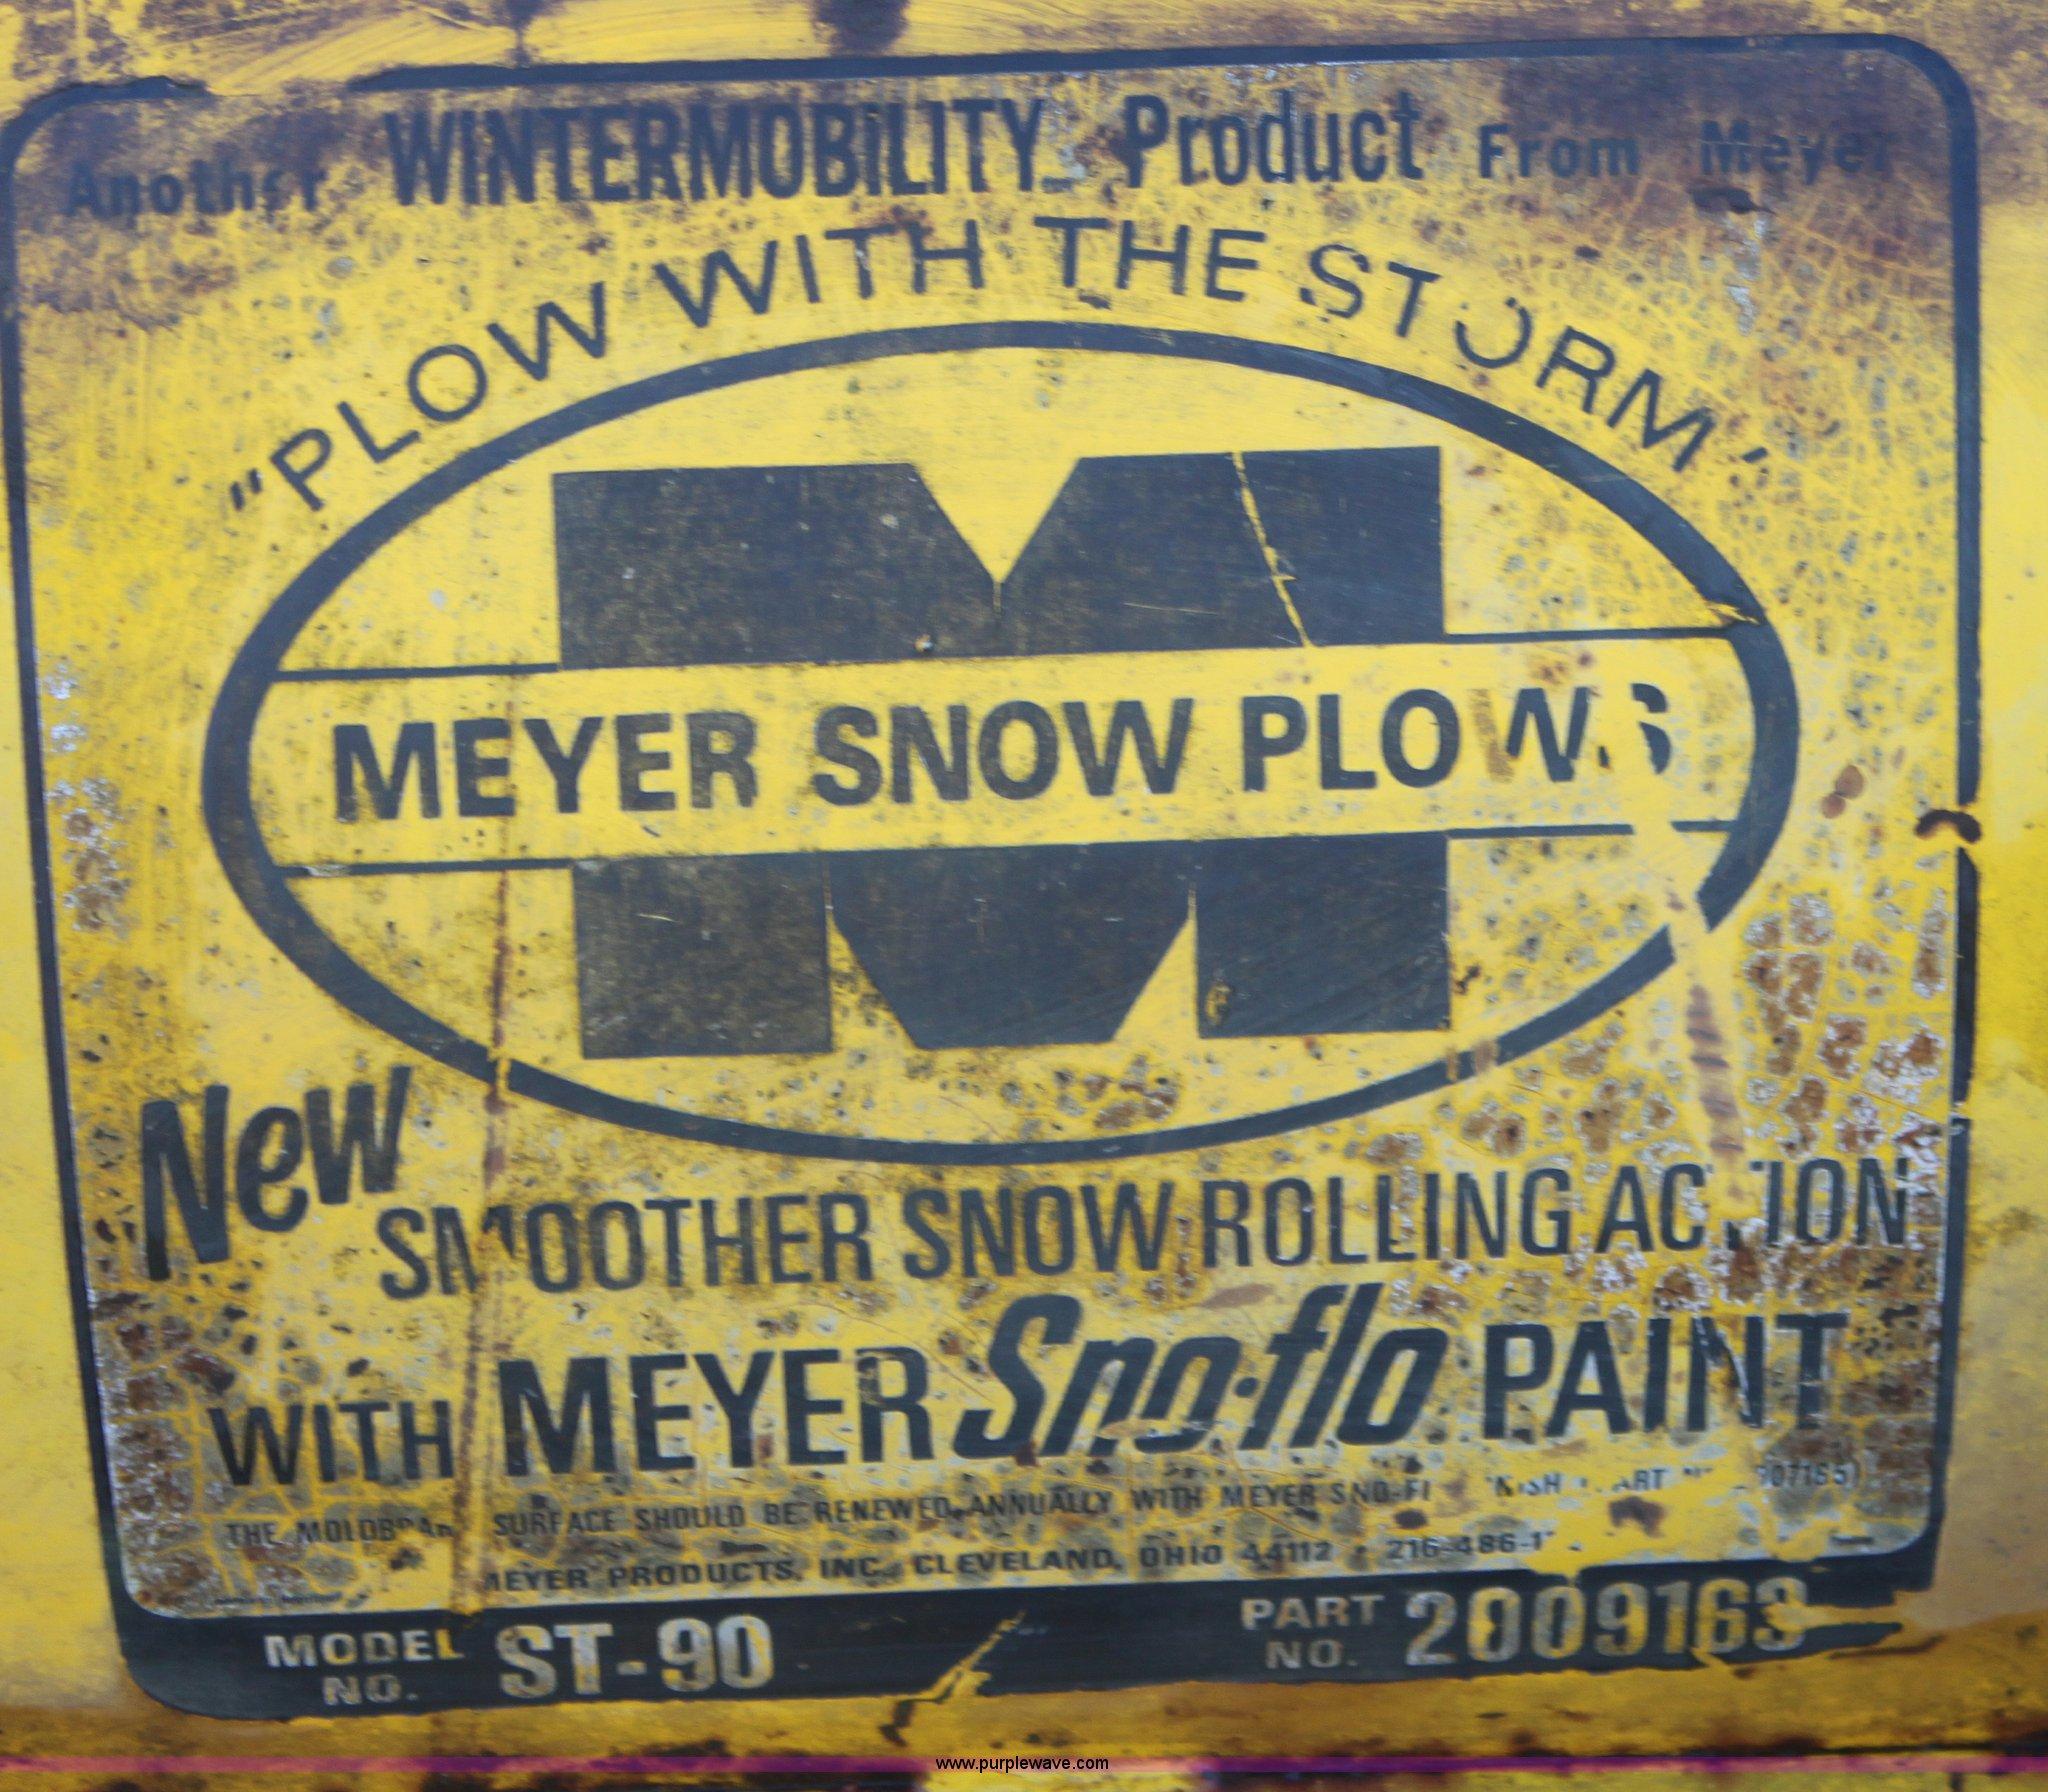 Meyer Model St 90 Wiring Diagram St90 Snow Plow Full Size In New Window